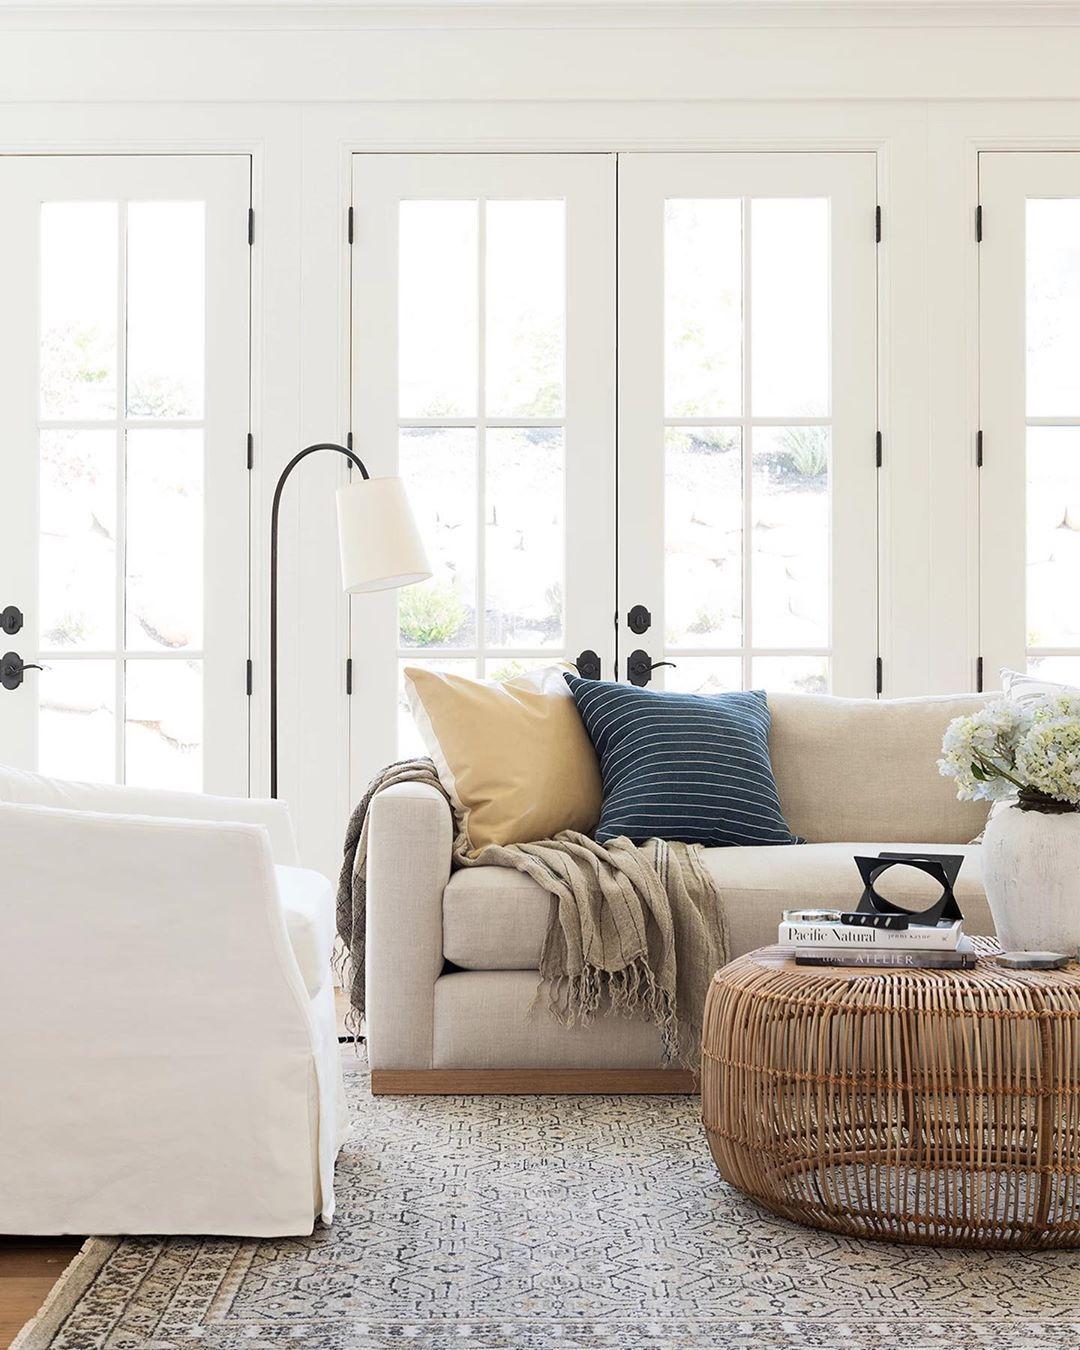 Get Home Design Ideas: This Corner Always Inspires Us To Get Cozy